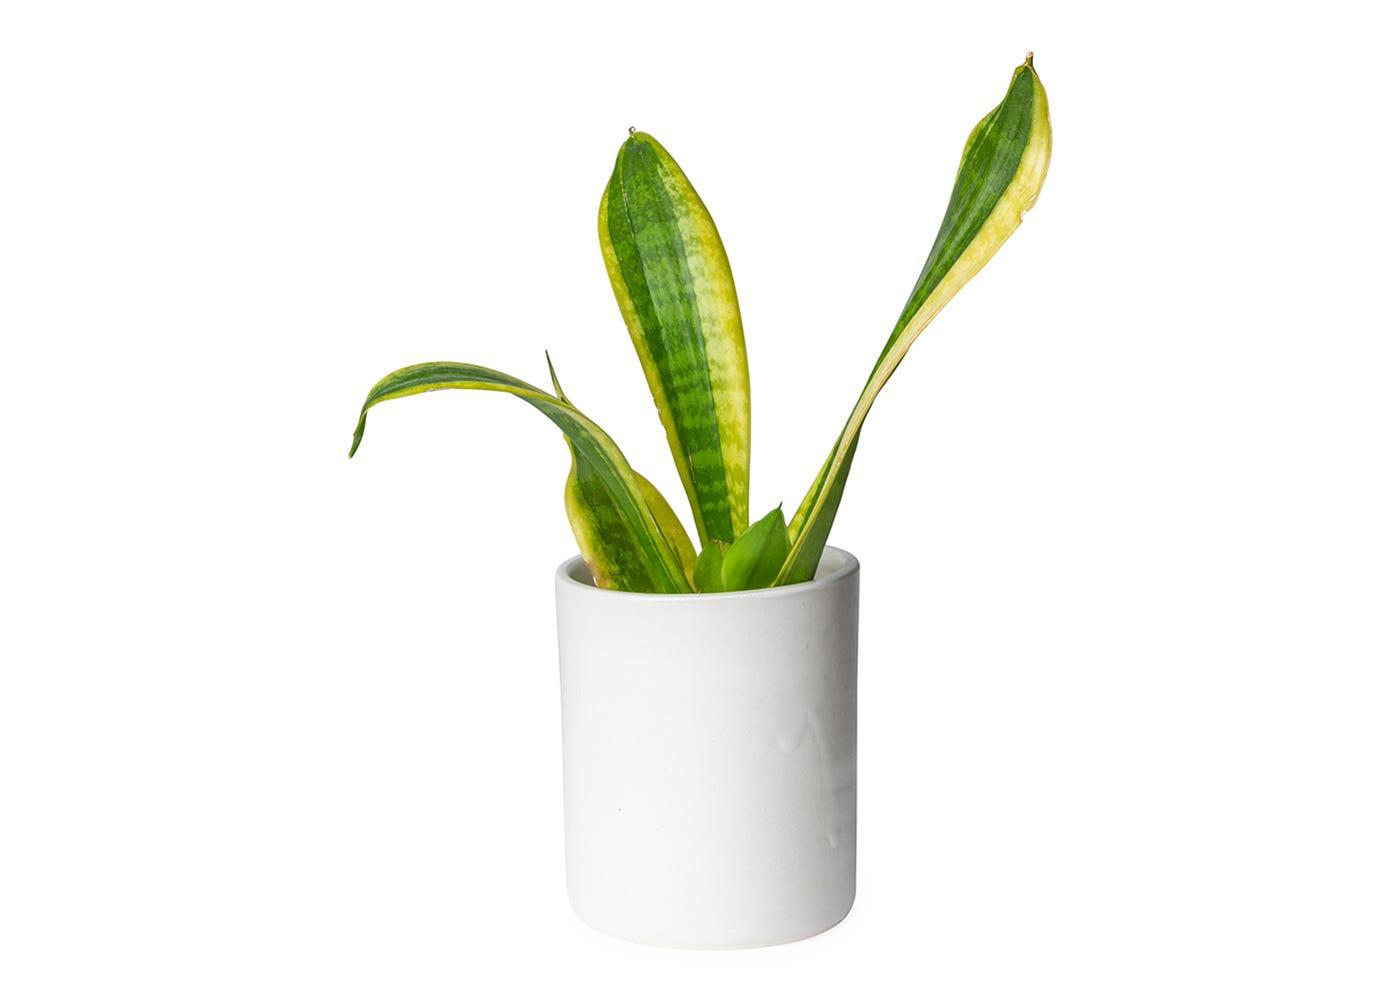 Porcelain vessel can be reused as a plant pot